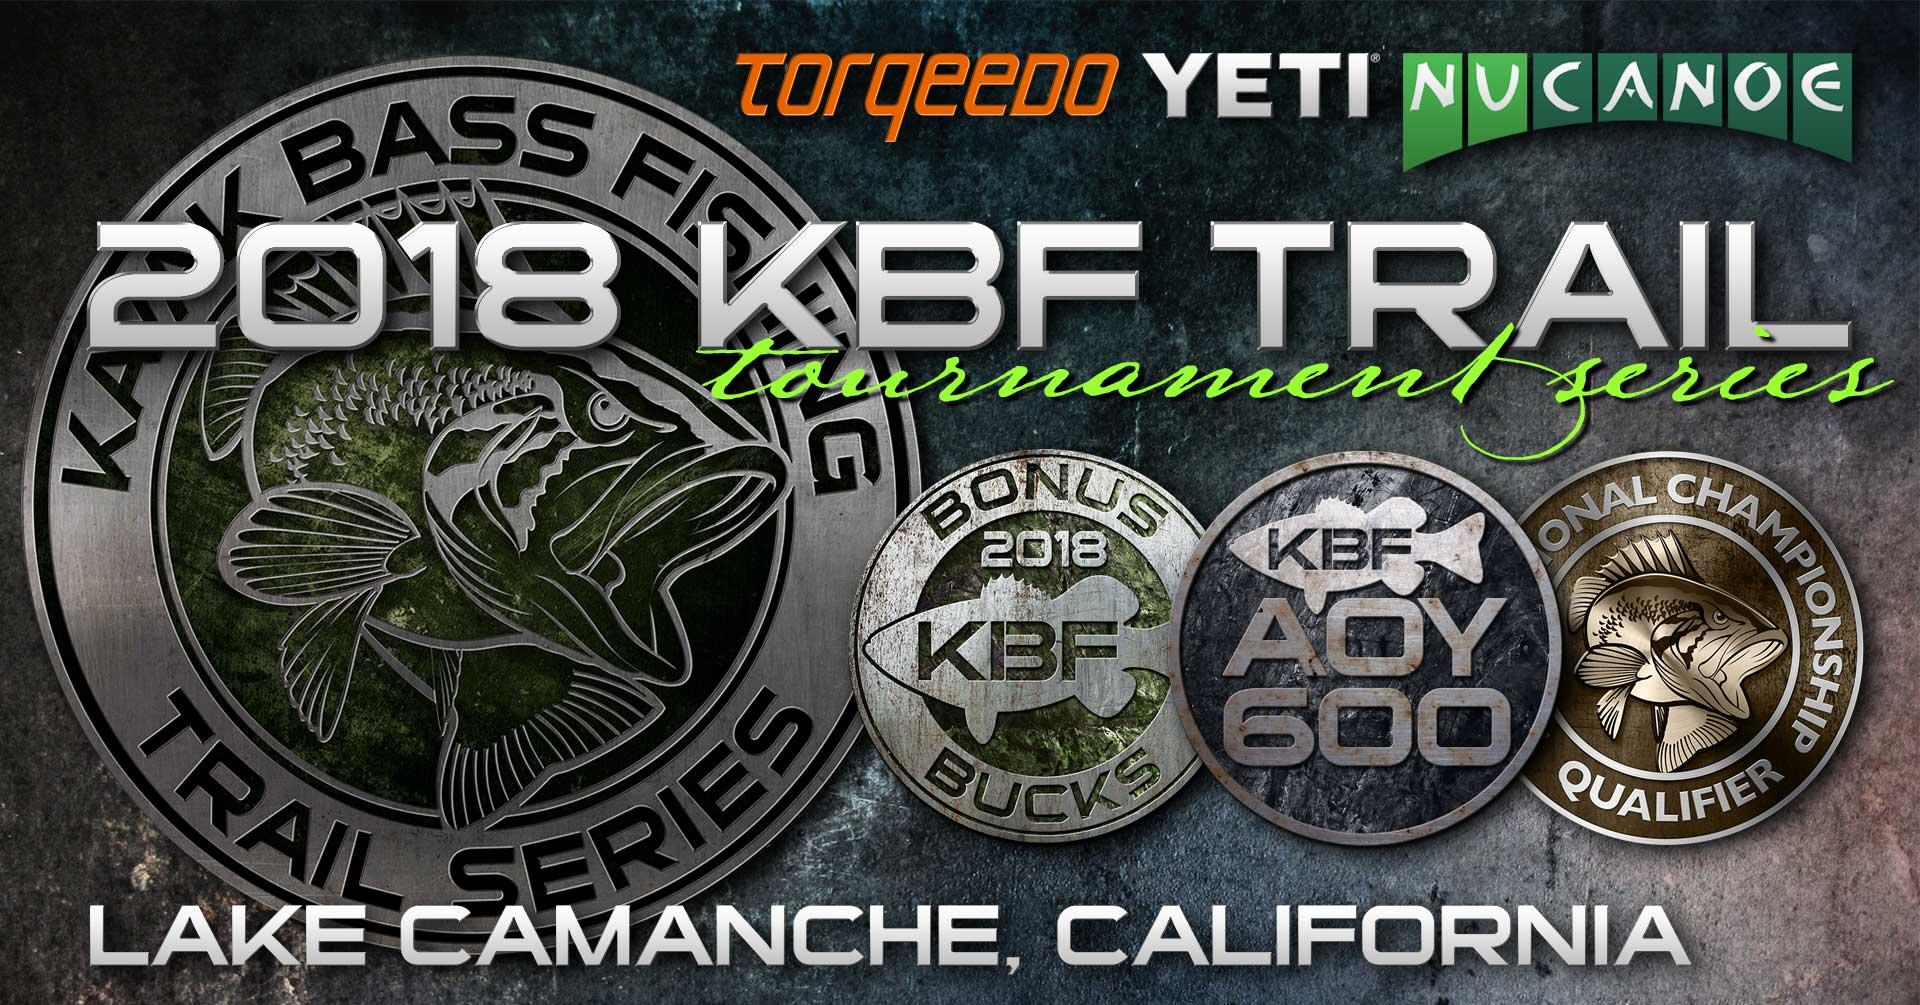 2018 KBF TRAIL 02 Camanche Lake, CA